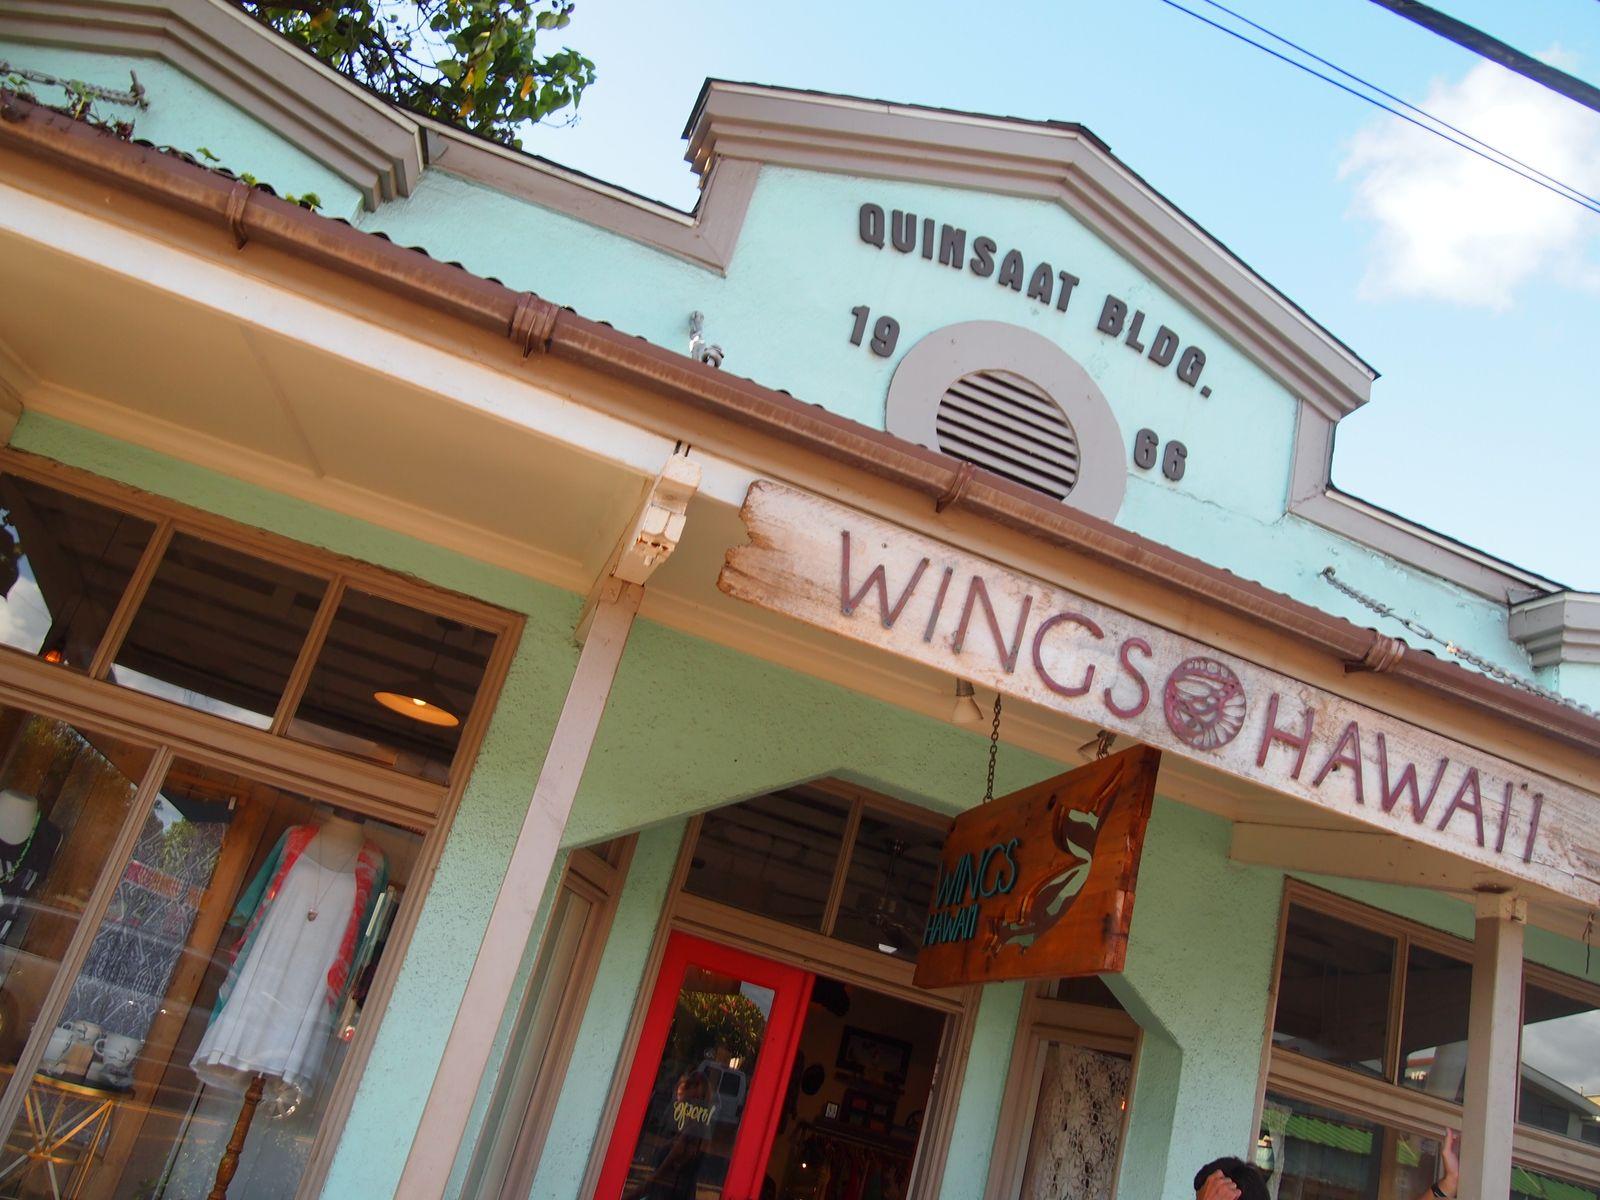 http://www.wingshawaii.com/